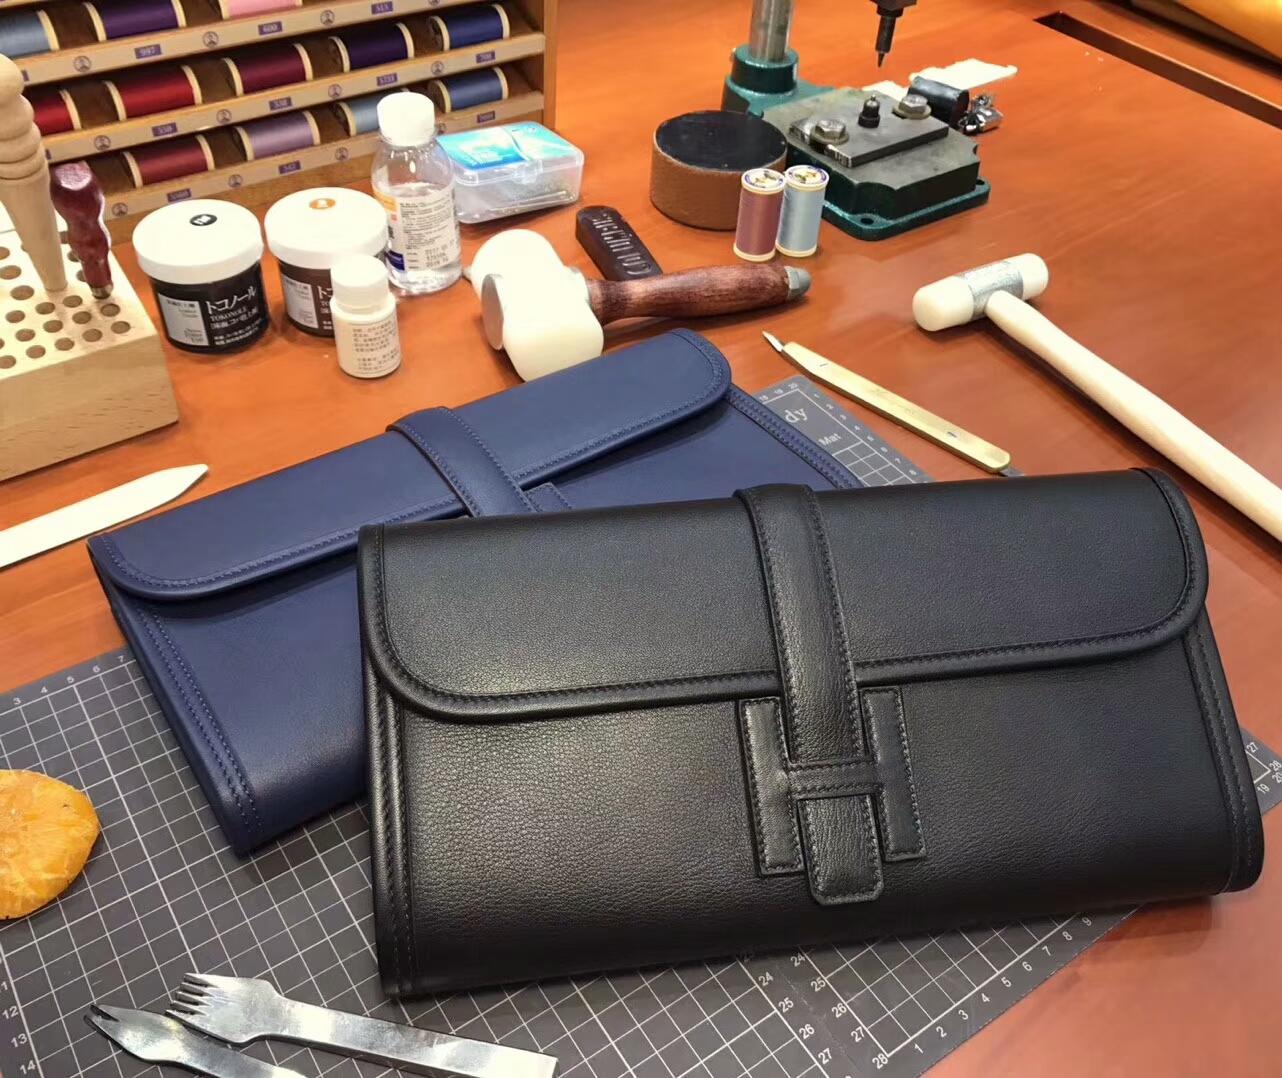 BLACK 黑色 HERMES 爱马仕 手包 配全套专柜原版包装 全球发售